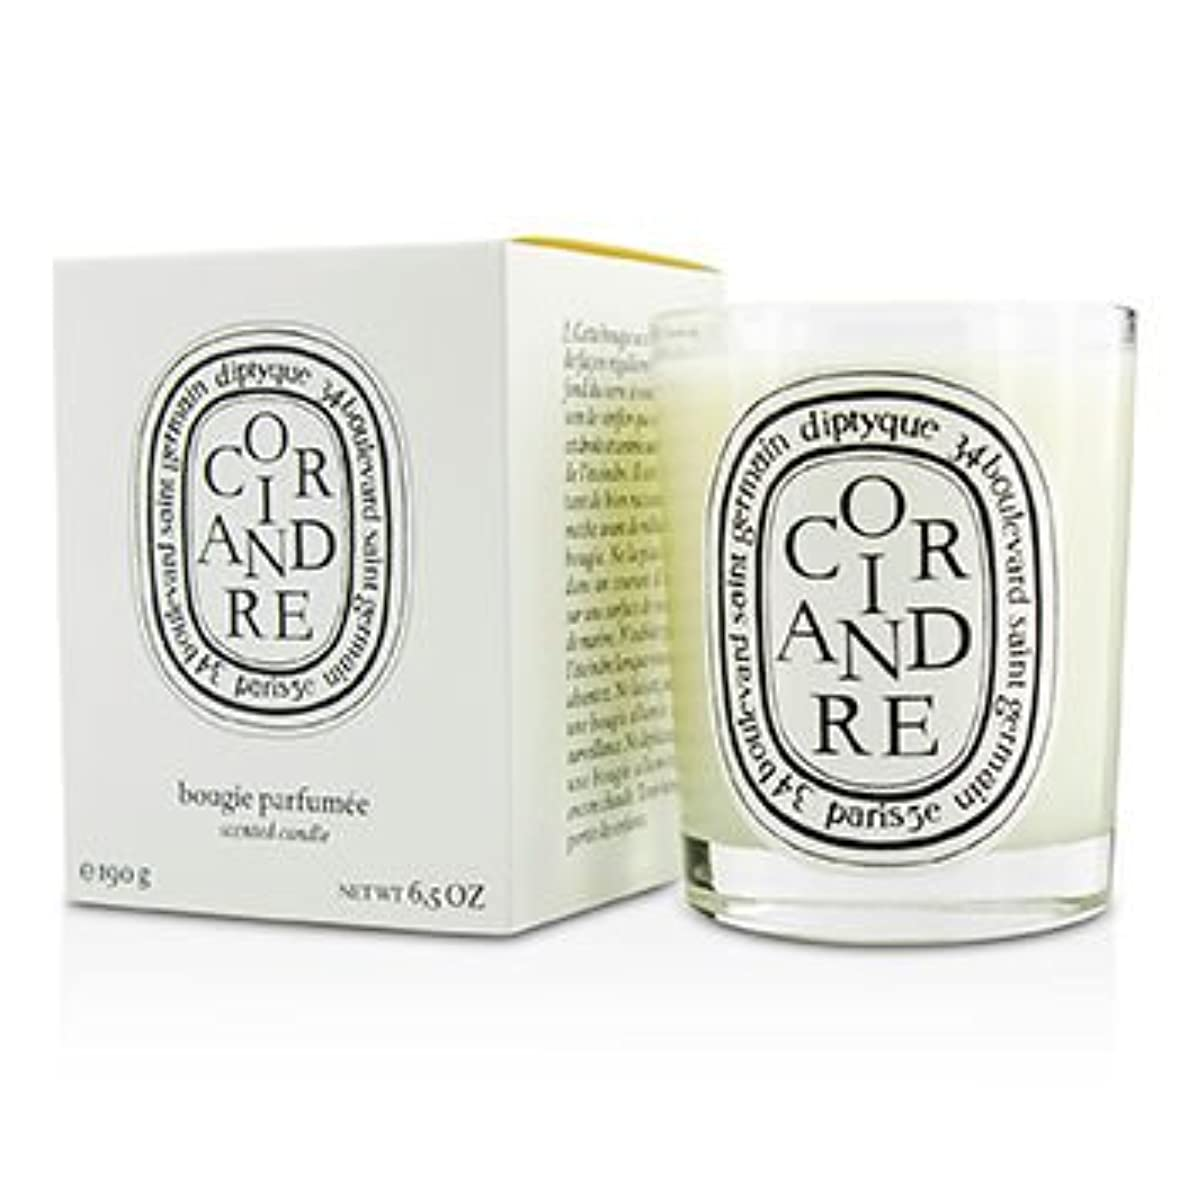 [Diptyque] Scented Candle - Coriandre (Coriander) 190g/6.5oz